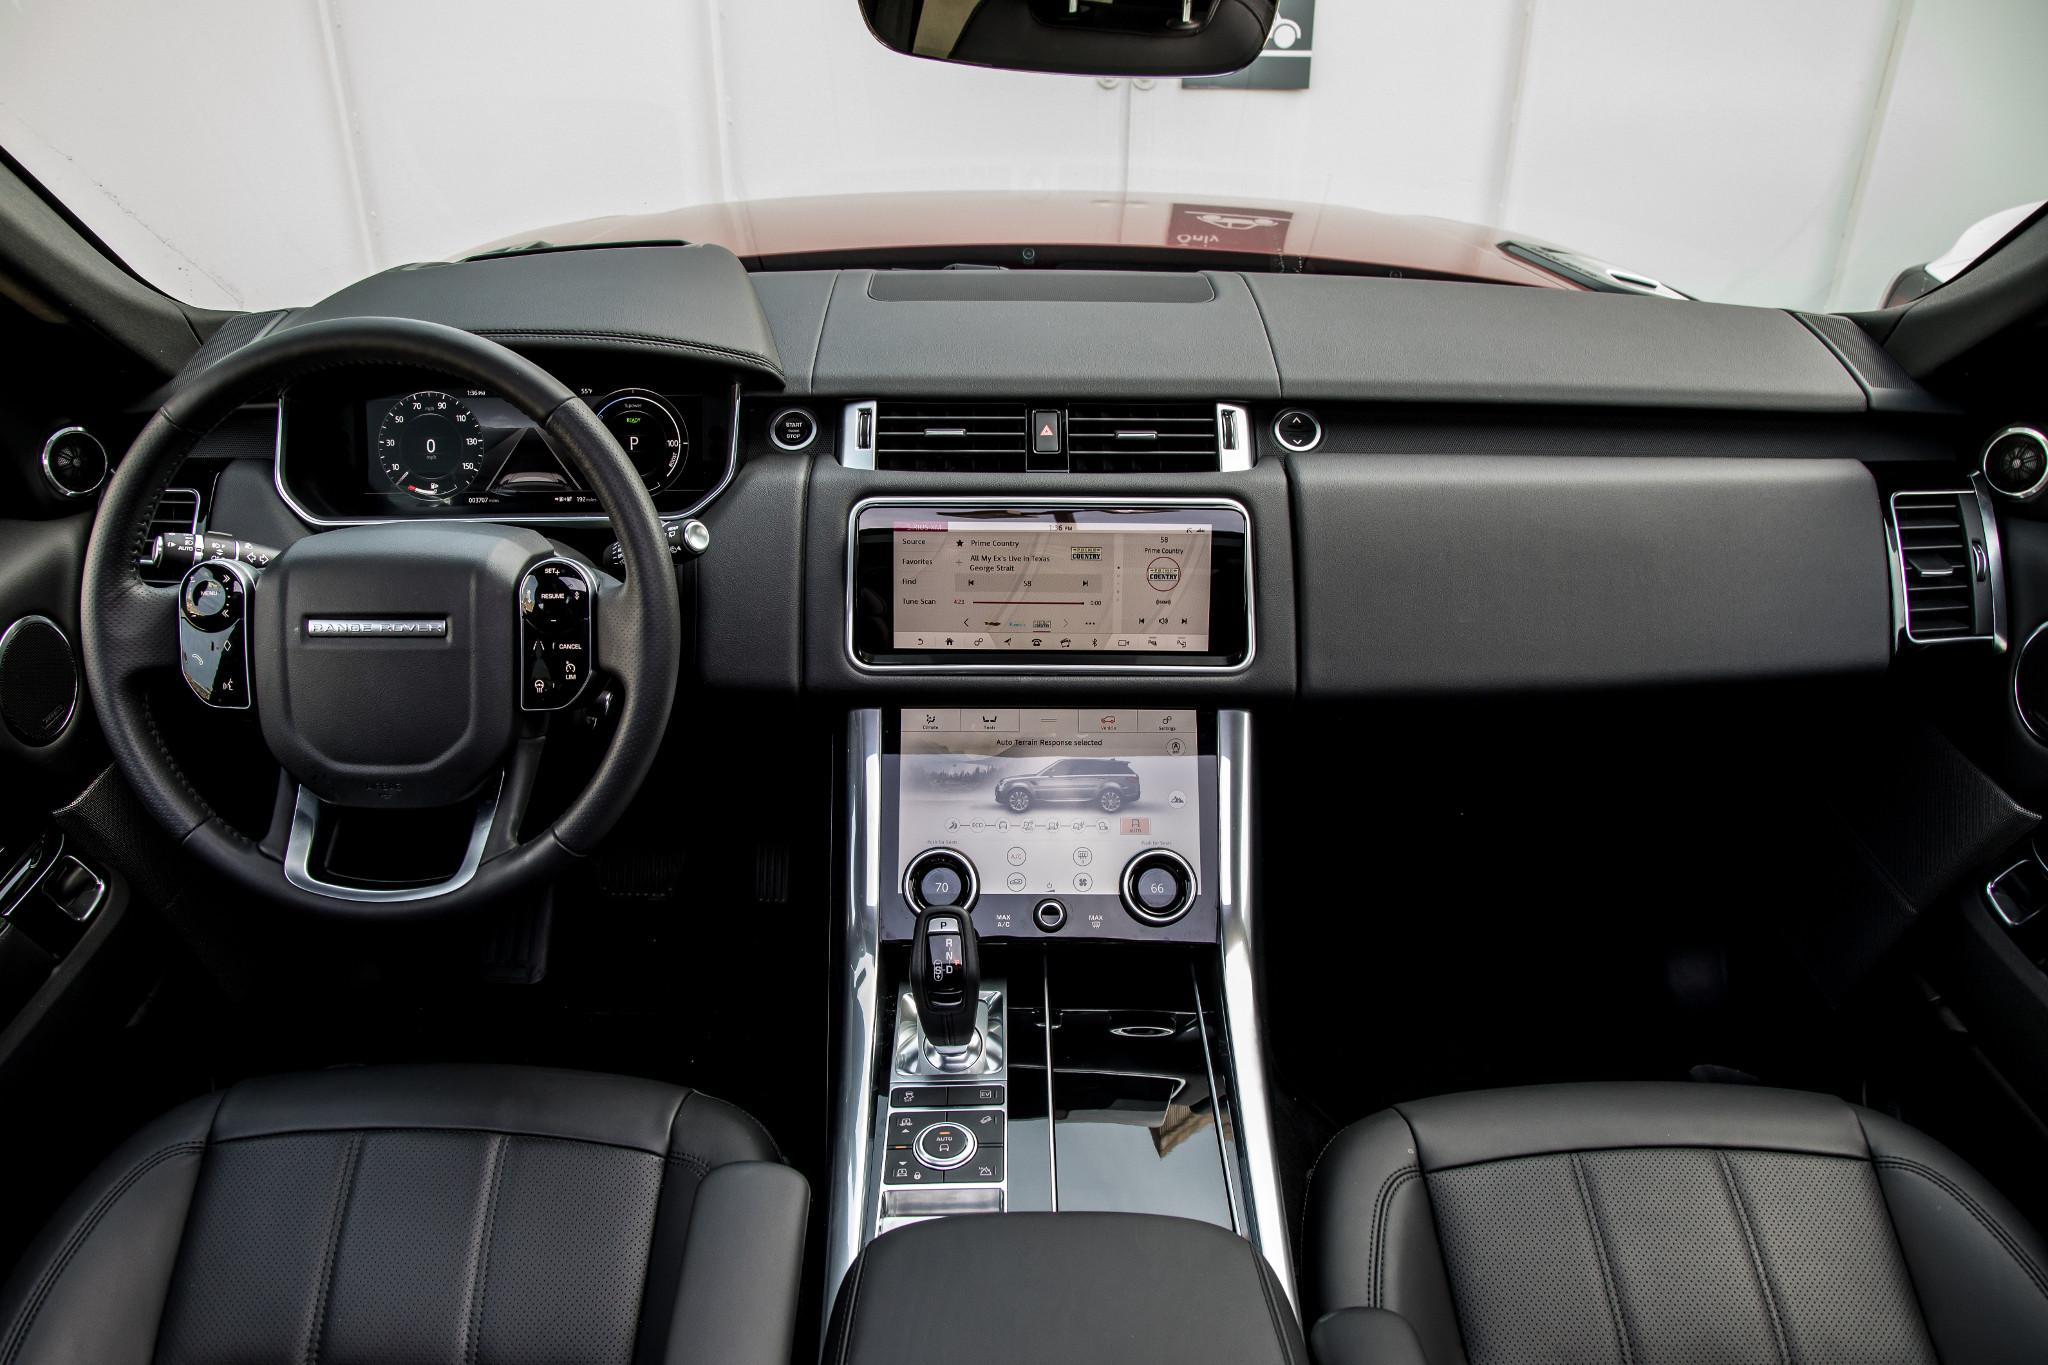 land-rover-range-rover-sport-2020-20-cockpit-shot--interior.jpg